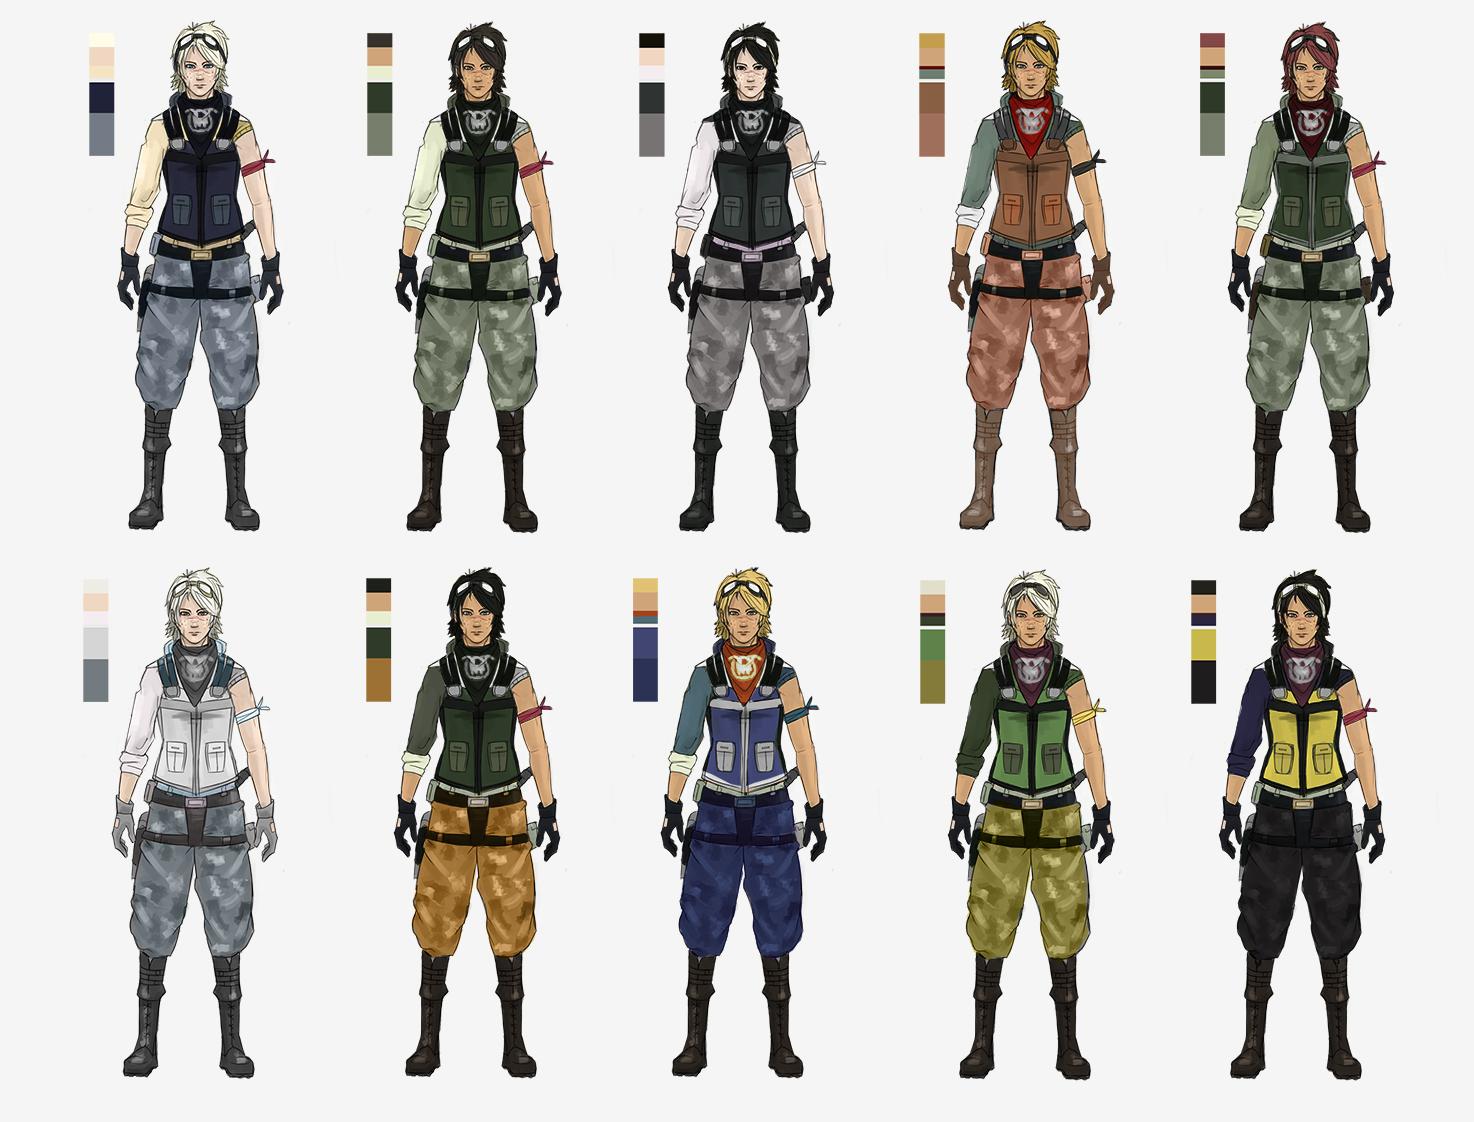 Character Design Color Scheme : Character color schemes by kaisercvr on deviantart